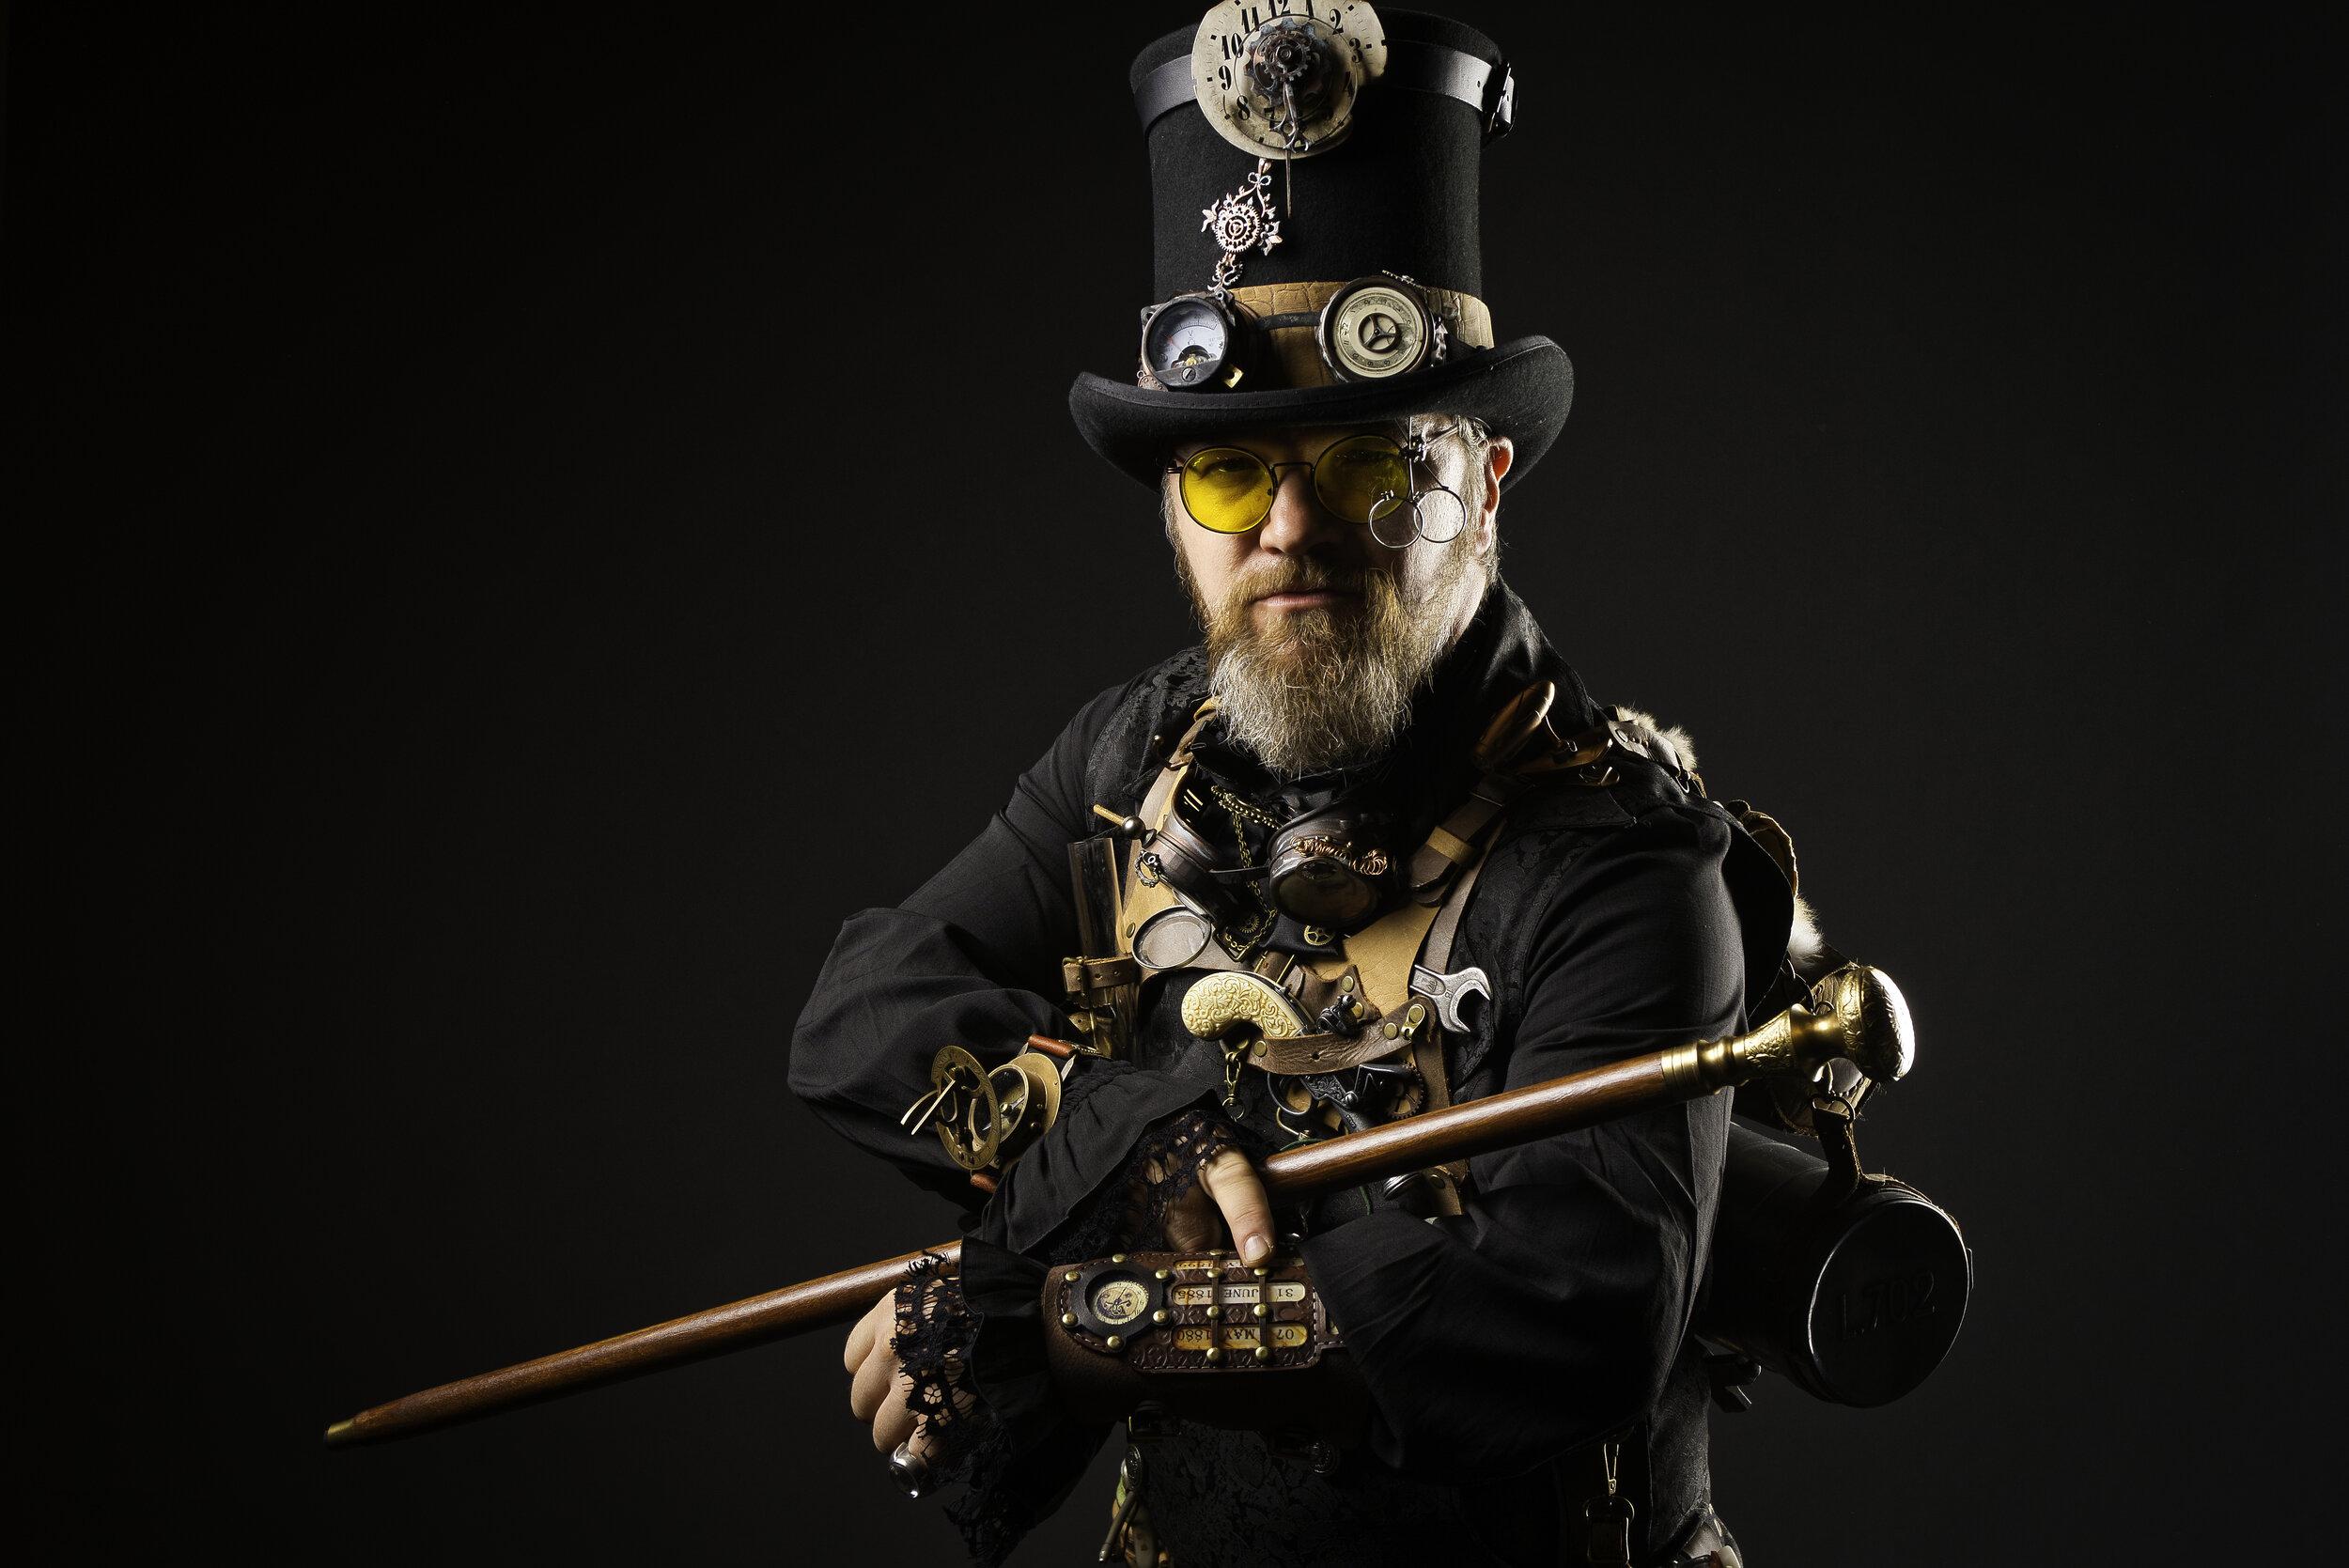 viewfinder-creativeboody-photo-inspiration-day-shoot-grobet-digital-belgium-godox-1.jpg